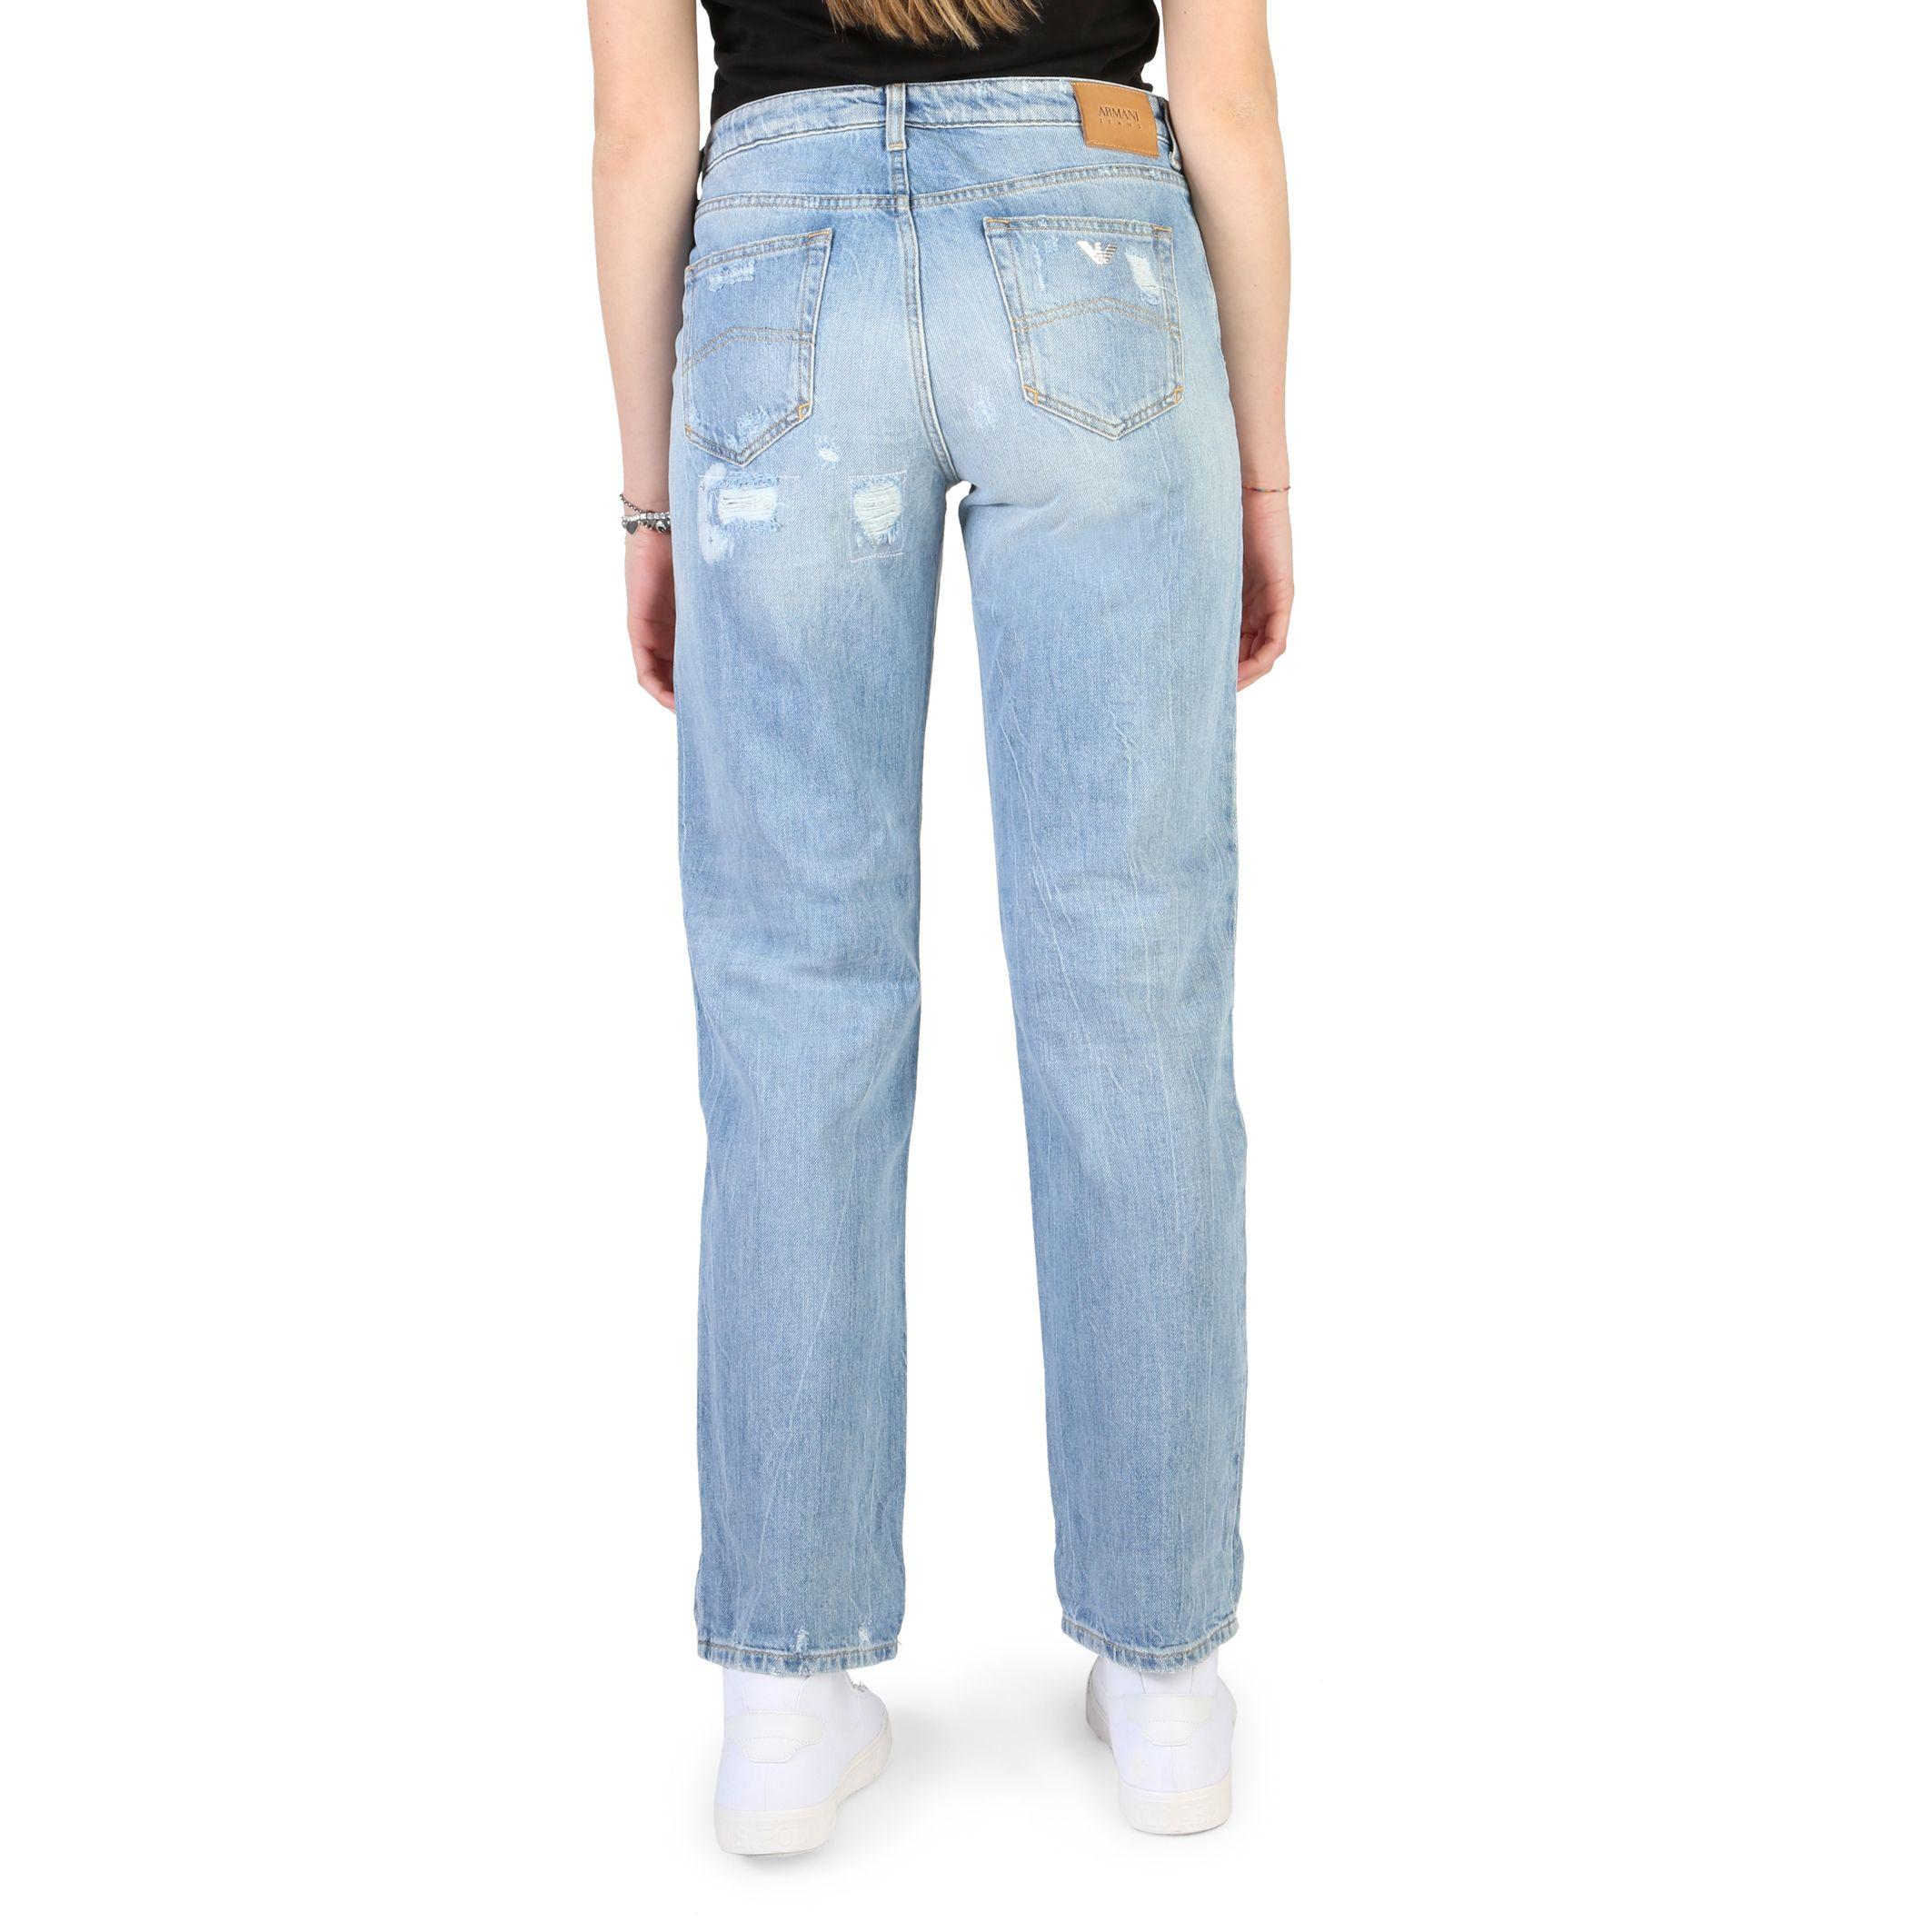 Jeans Armani Jeans – 3Y5J15_5D1AZ